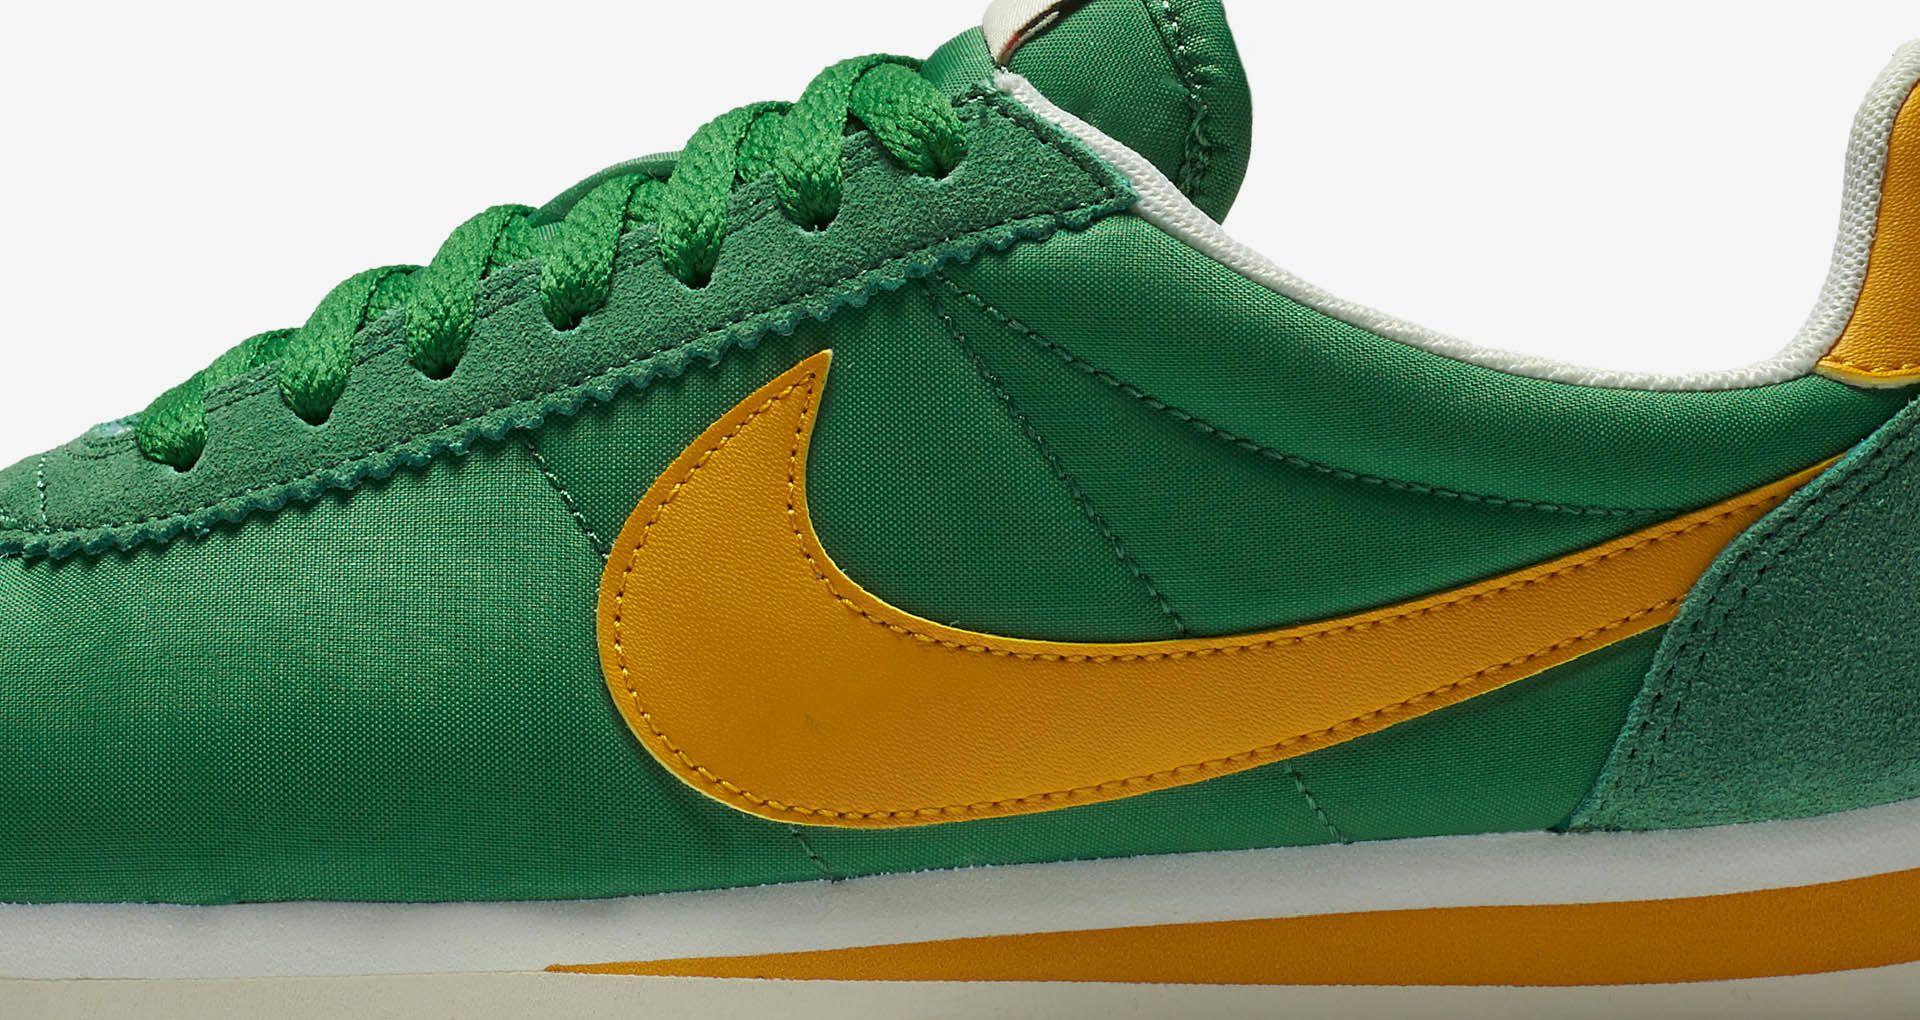 sale retailer 39691 fedf5 Women's Nike Classic Cortez Premium 'Classic Green & Yellow ...